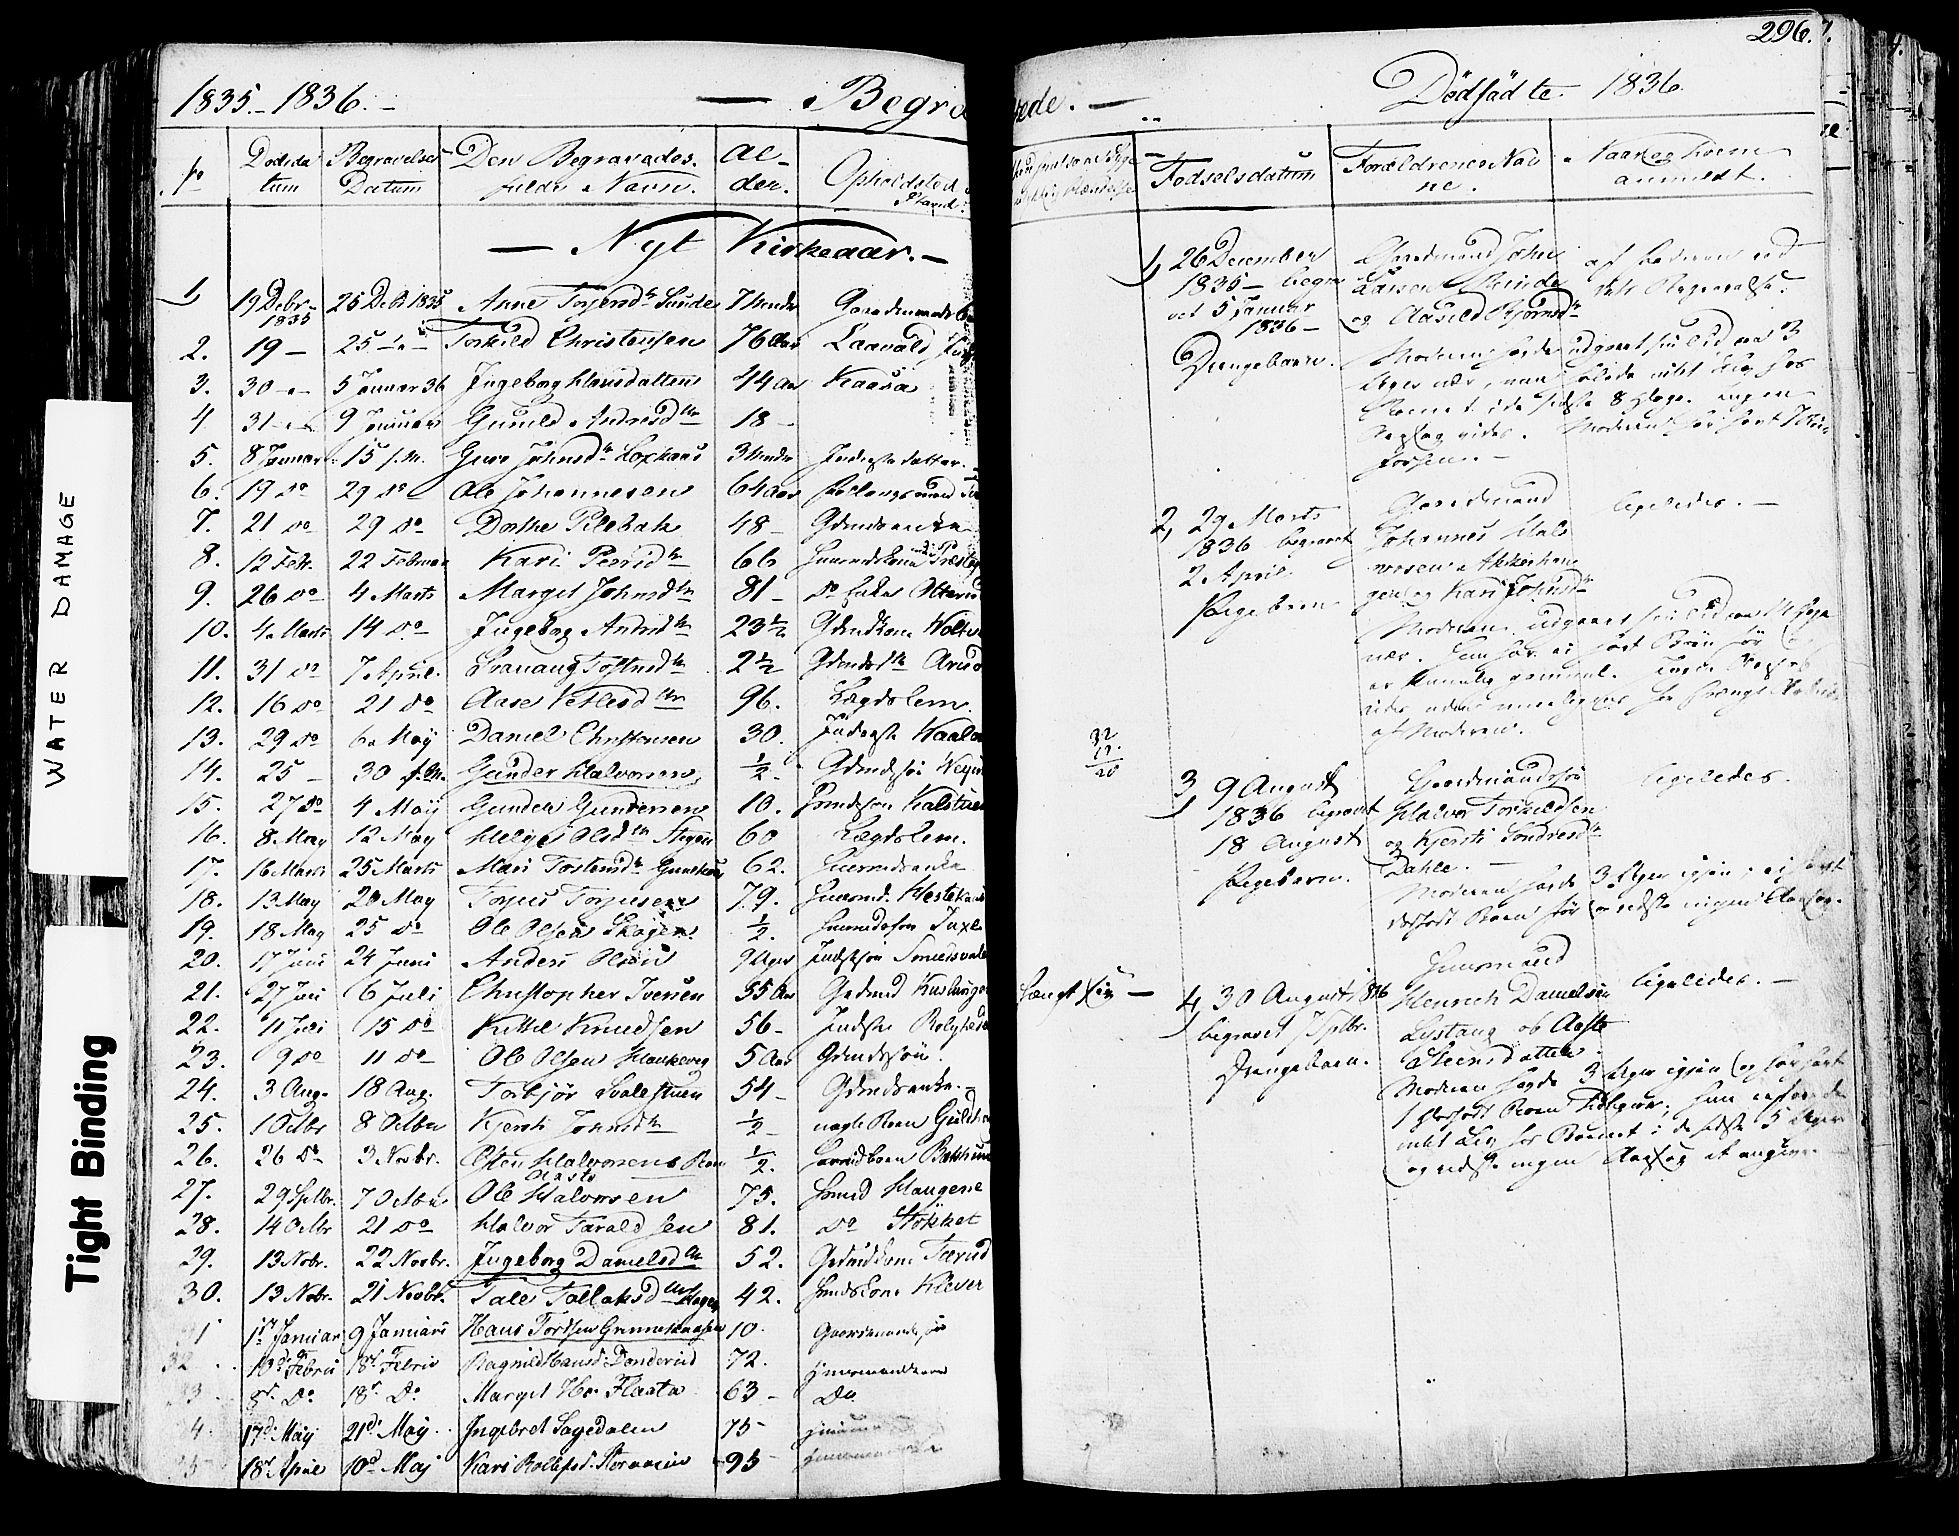 SAKO, Sauherad kirkebøker, F/Fa/L0006: Ministerialbok nr. I 6, 1827-1850, s. 296